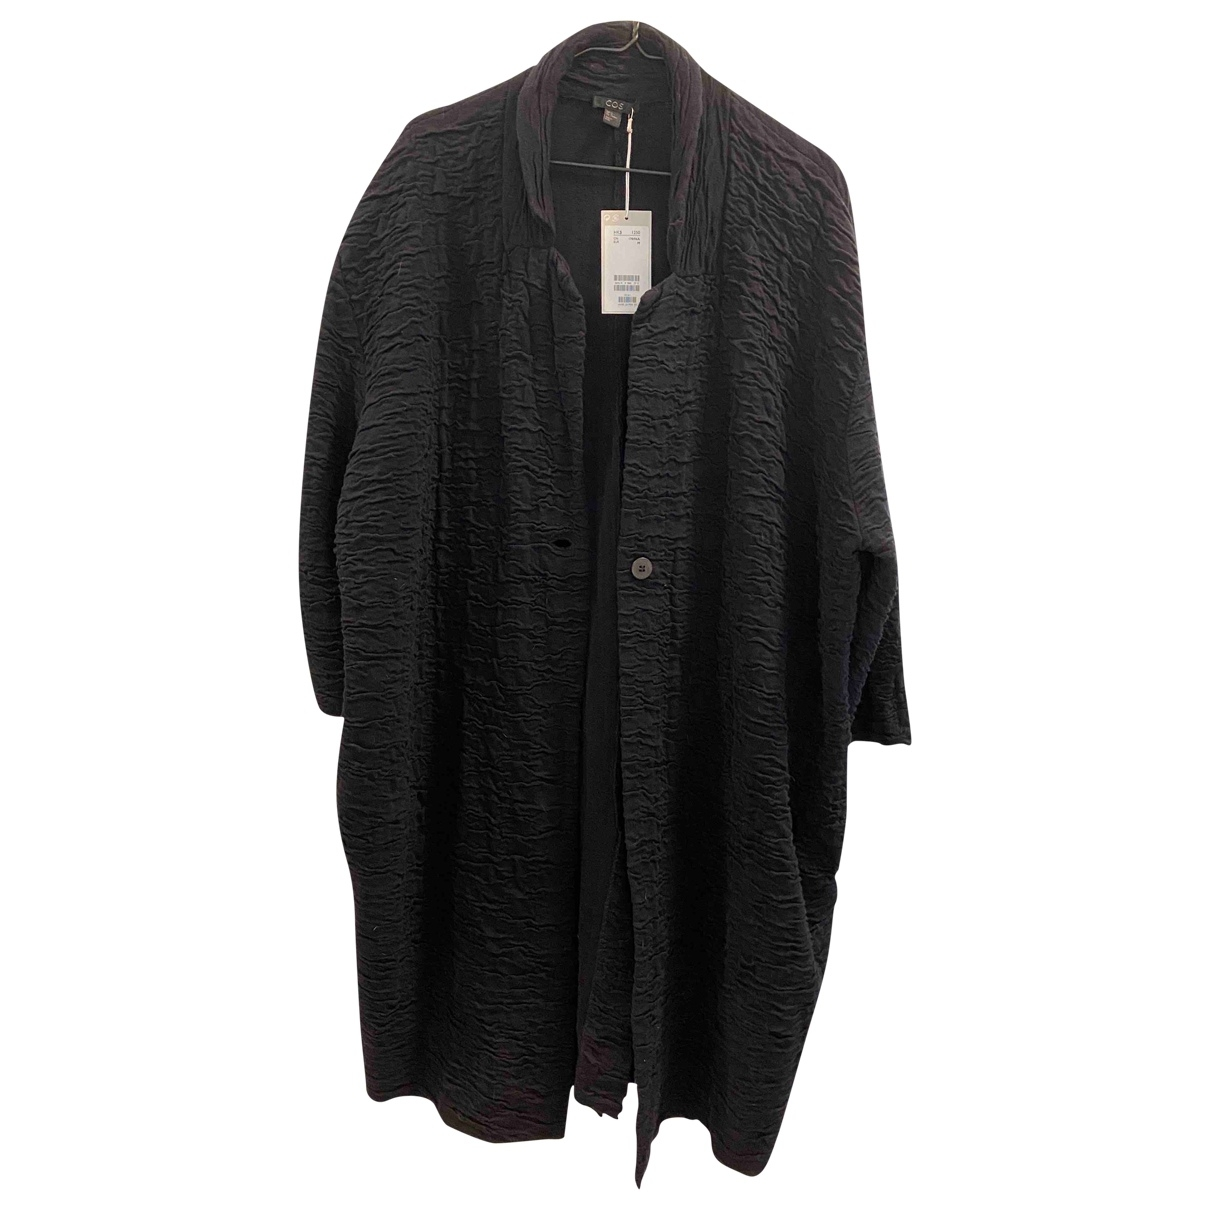 Cos \N Black Cotton coat for Women M International